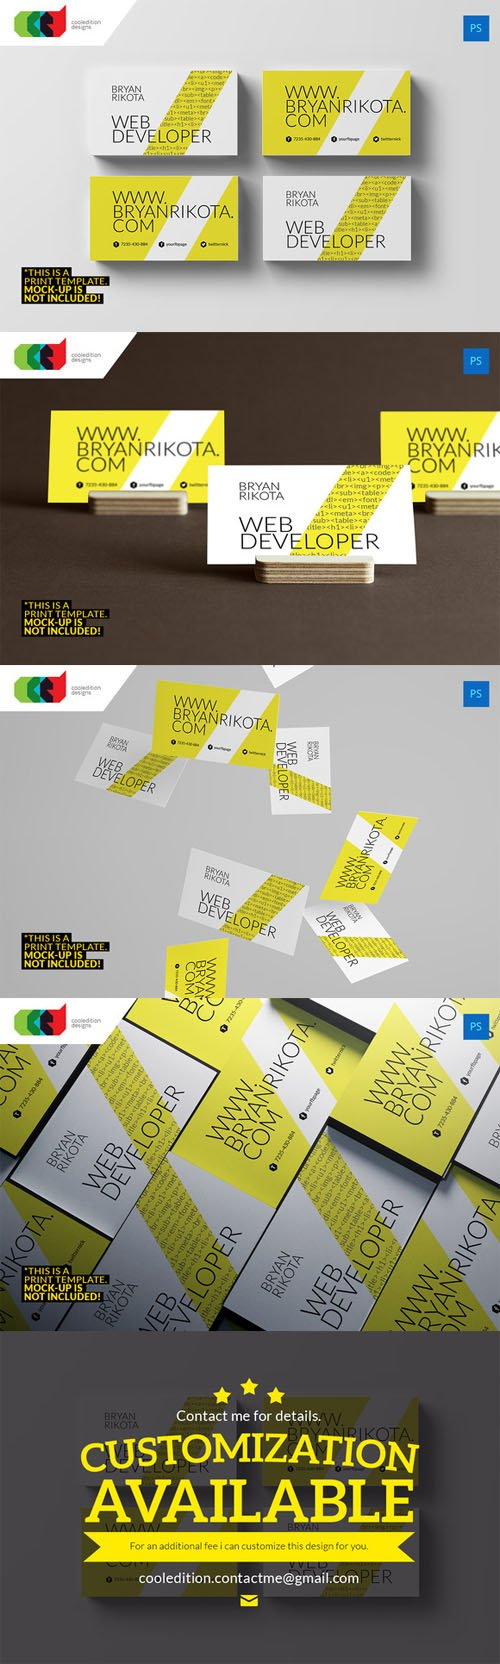 Web Developer - Business Card 71 - CM 314039